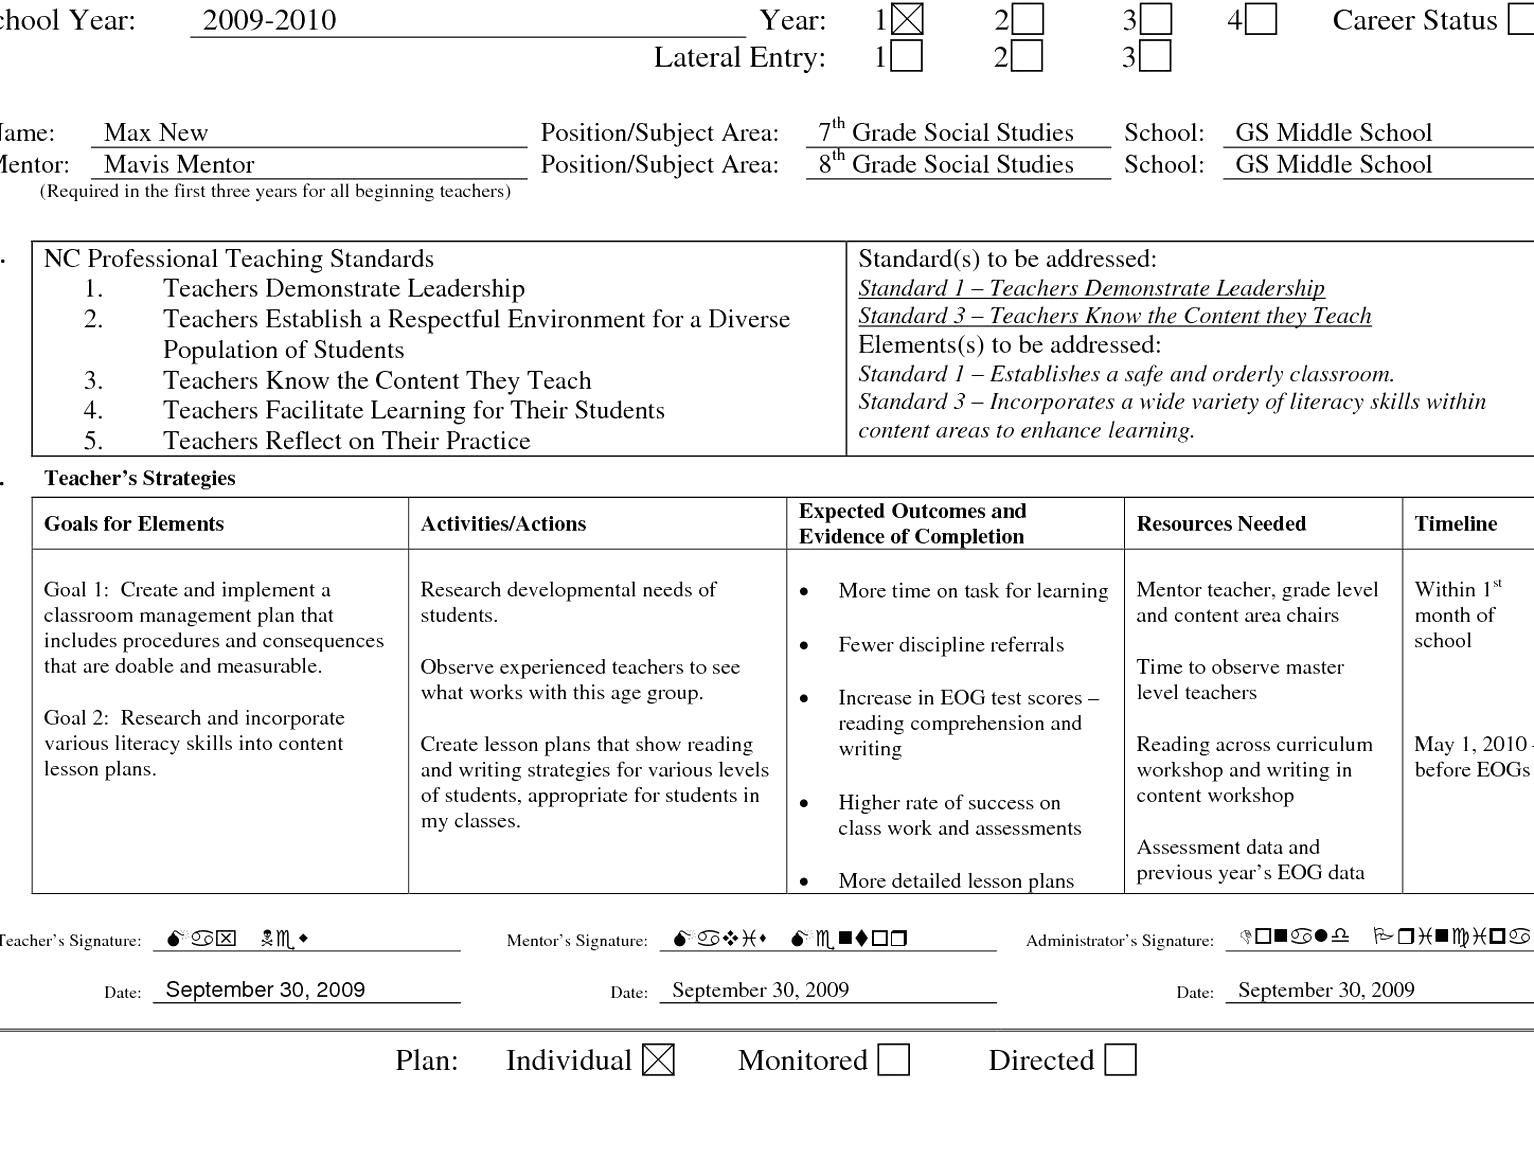 Professional Development Plan Sample For Teachers Fresh Professional Learning Plan Examp Professional Development Plan Teaching Standards Professional Learning Sample of professional development plan